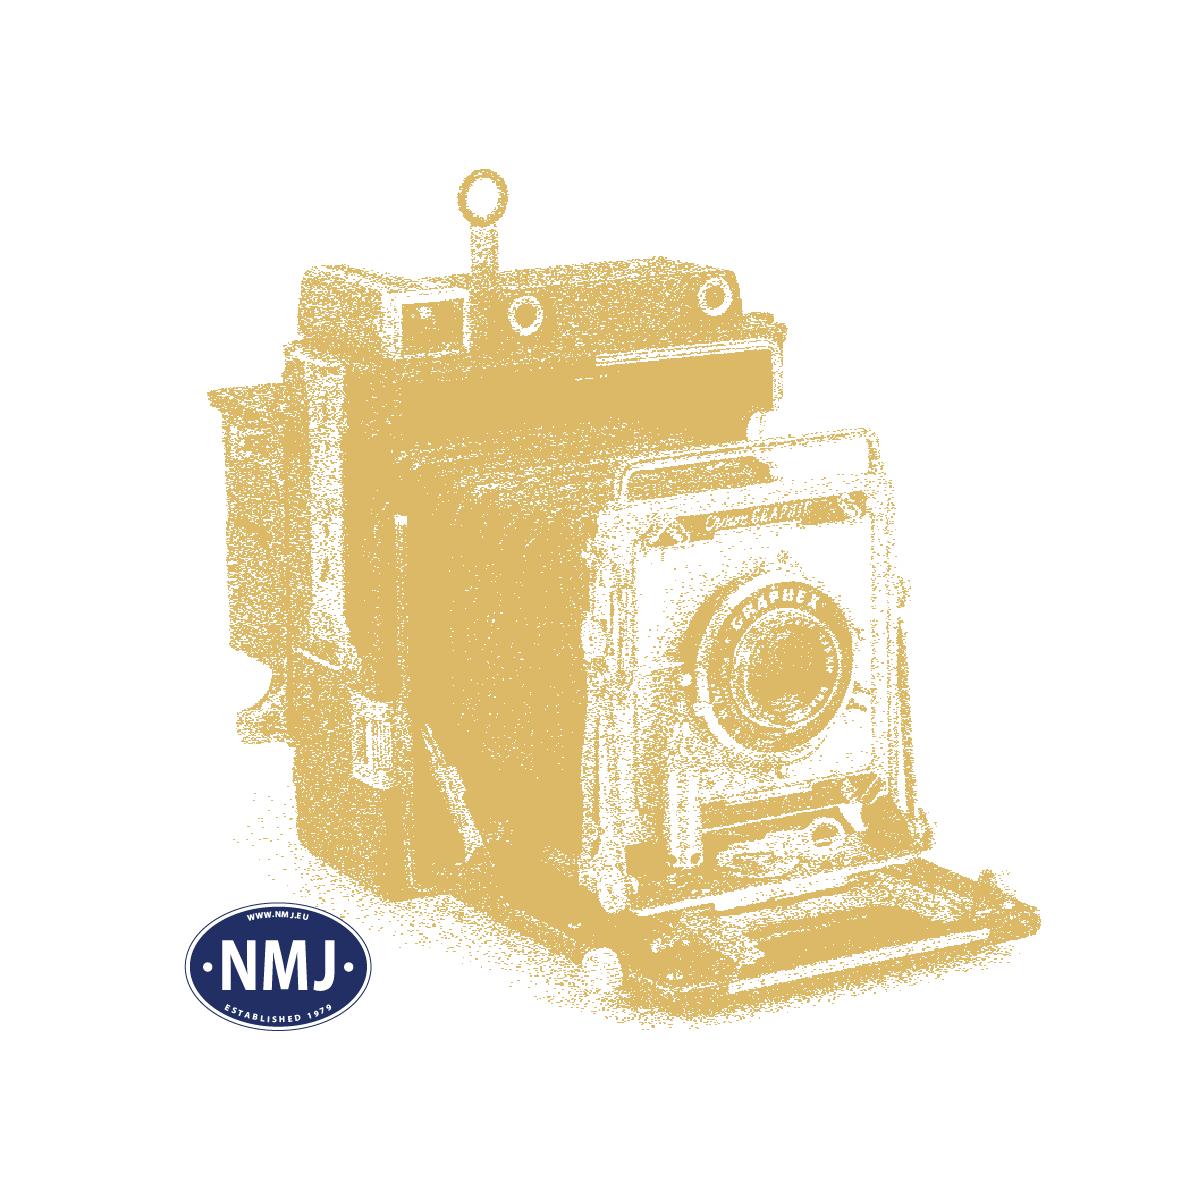 NOC15551 - Pensjonister